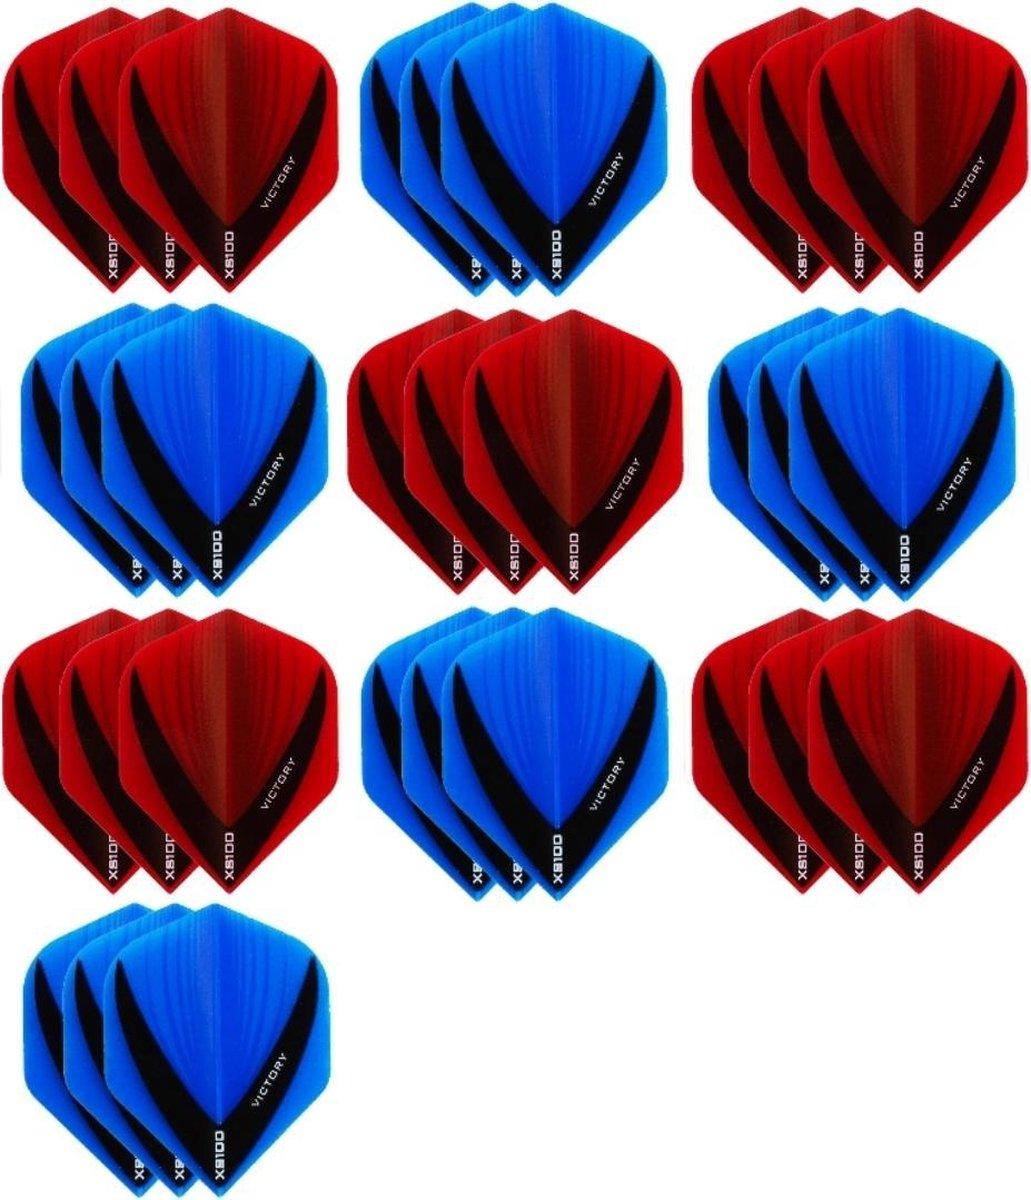 10 sets (30 stuks) - XS100 Vista flights - duo kleur pakket - Aqua/Blauw en Rood - flights - dartflights